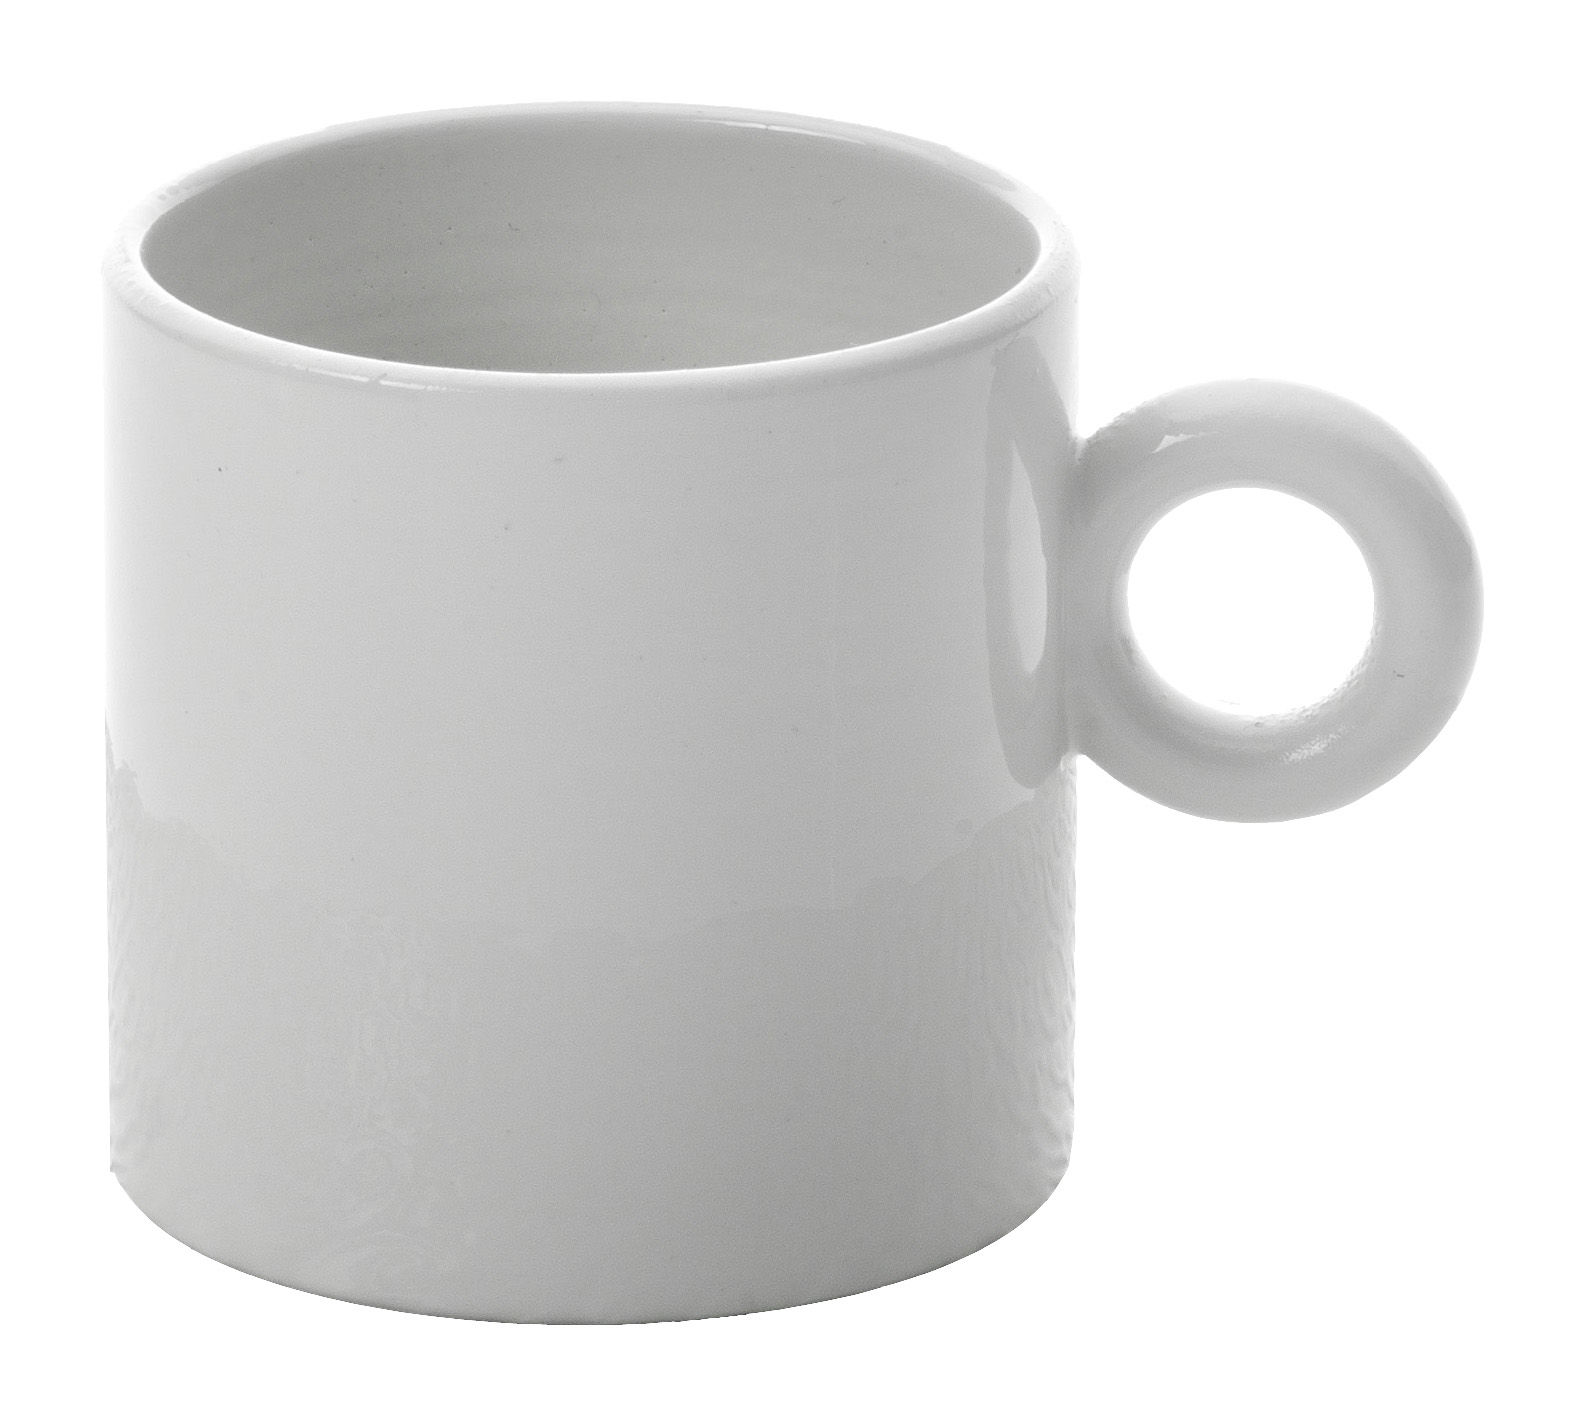 Tavola - Tazze e Boccali - Tazzina da caffè Dressed di Alessi - Tazzina per moka - Bianco - Porcellana